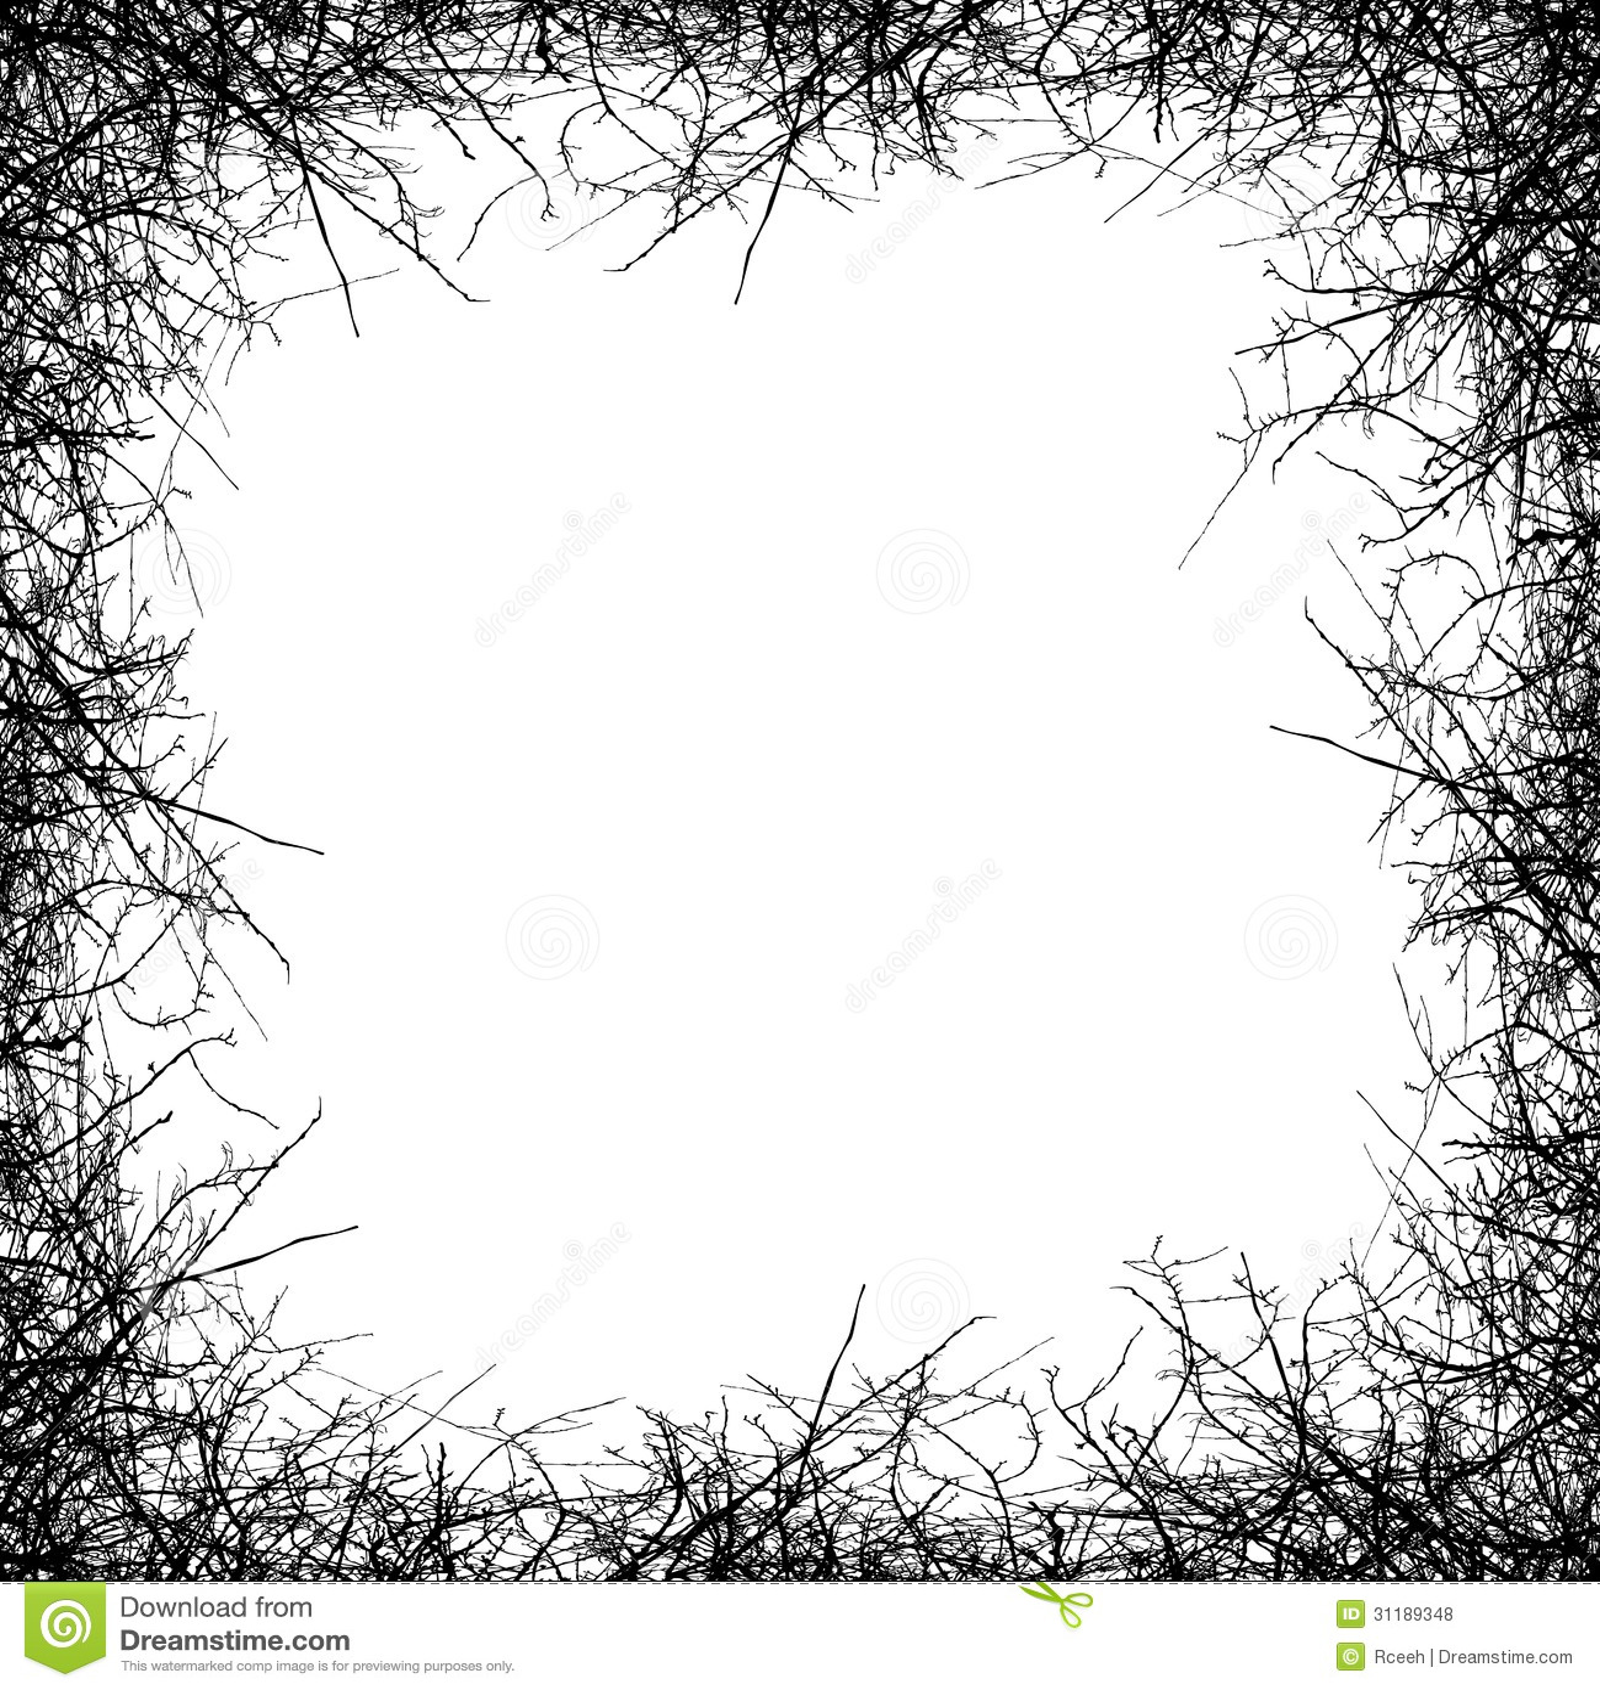 Borders Around Trees: Leafless Tree Border Stock Vector. Illustration Of Black